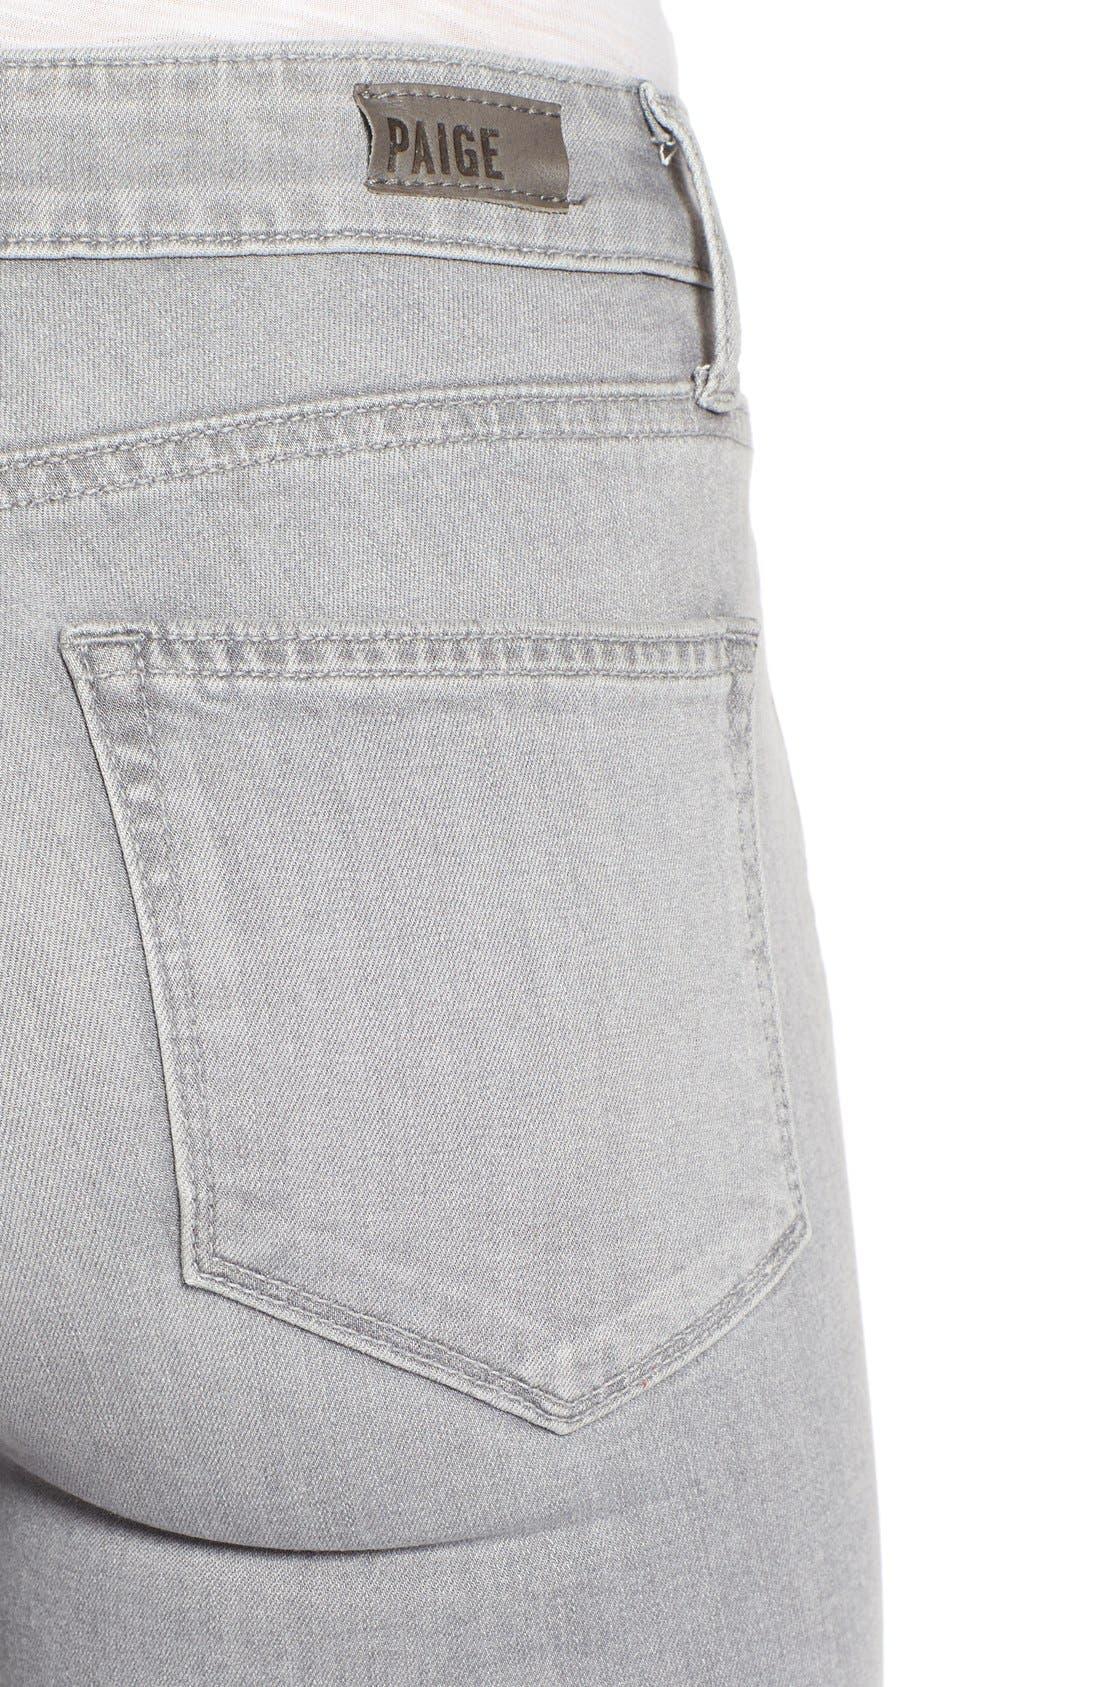 Alternate Image 5  - Paige Denim 'Verdugo' Ankle Skinny Jeans (Dove Grey)